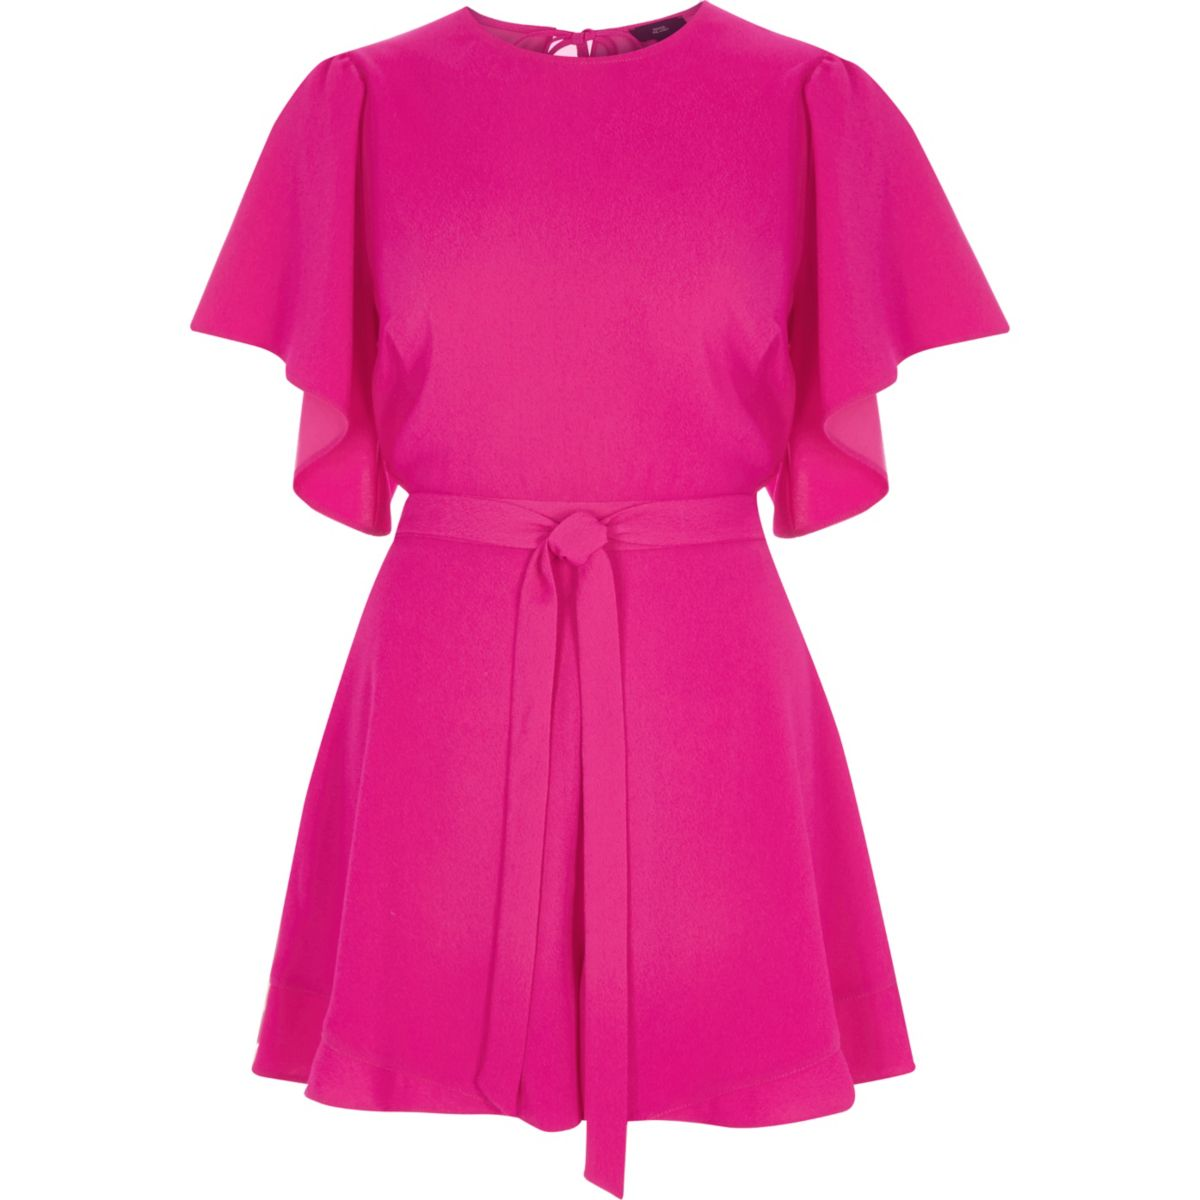 Pink short flare sleeve tie waist playsuit